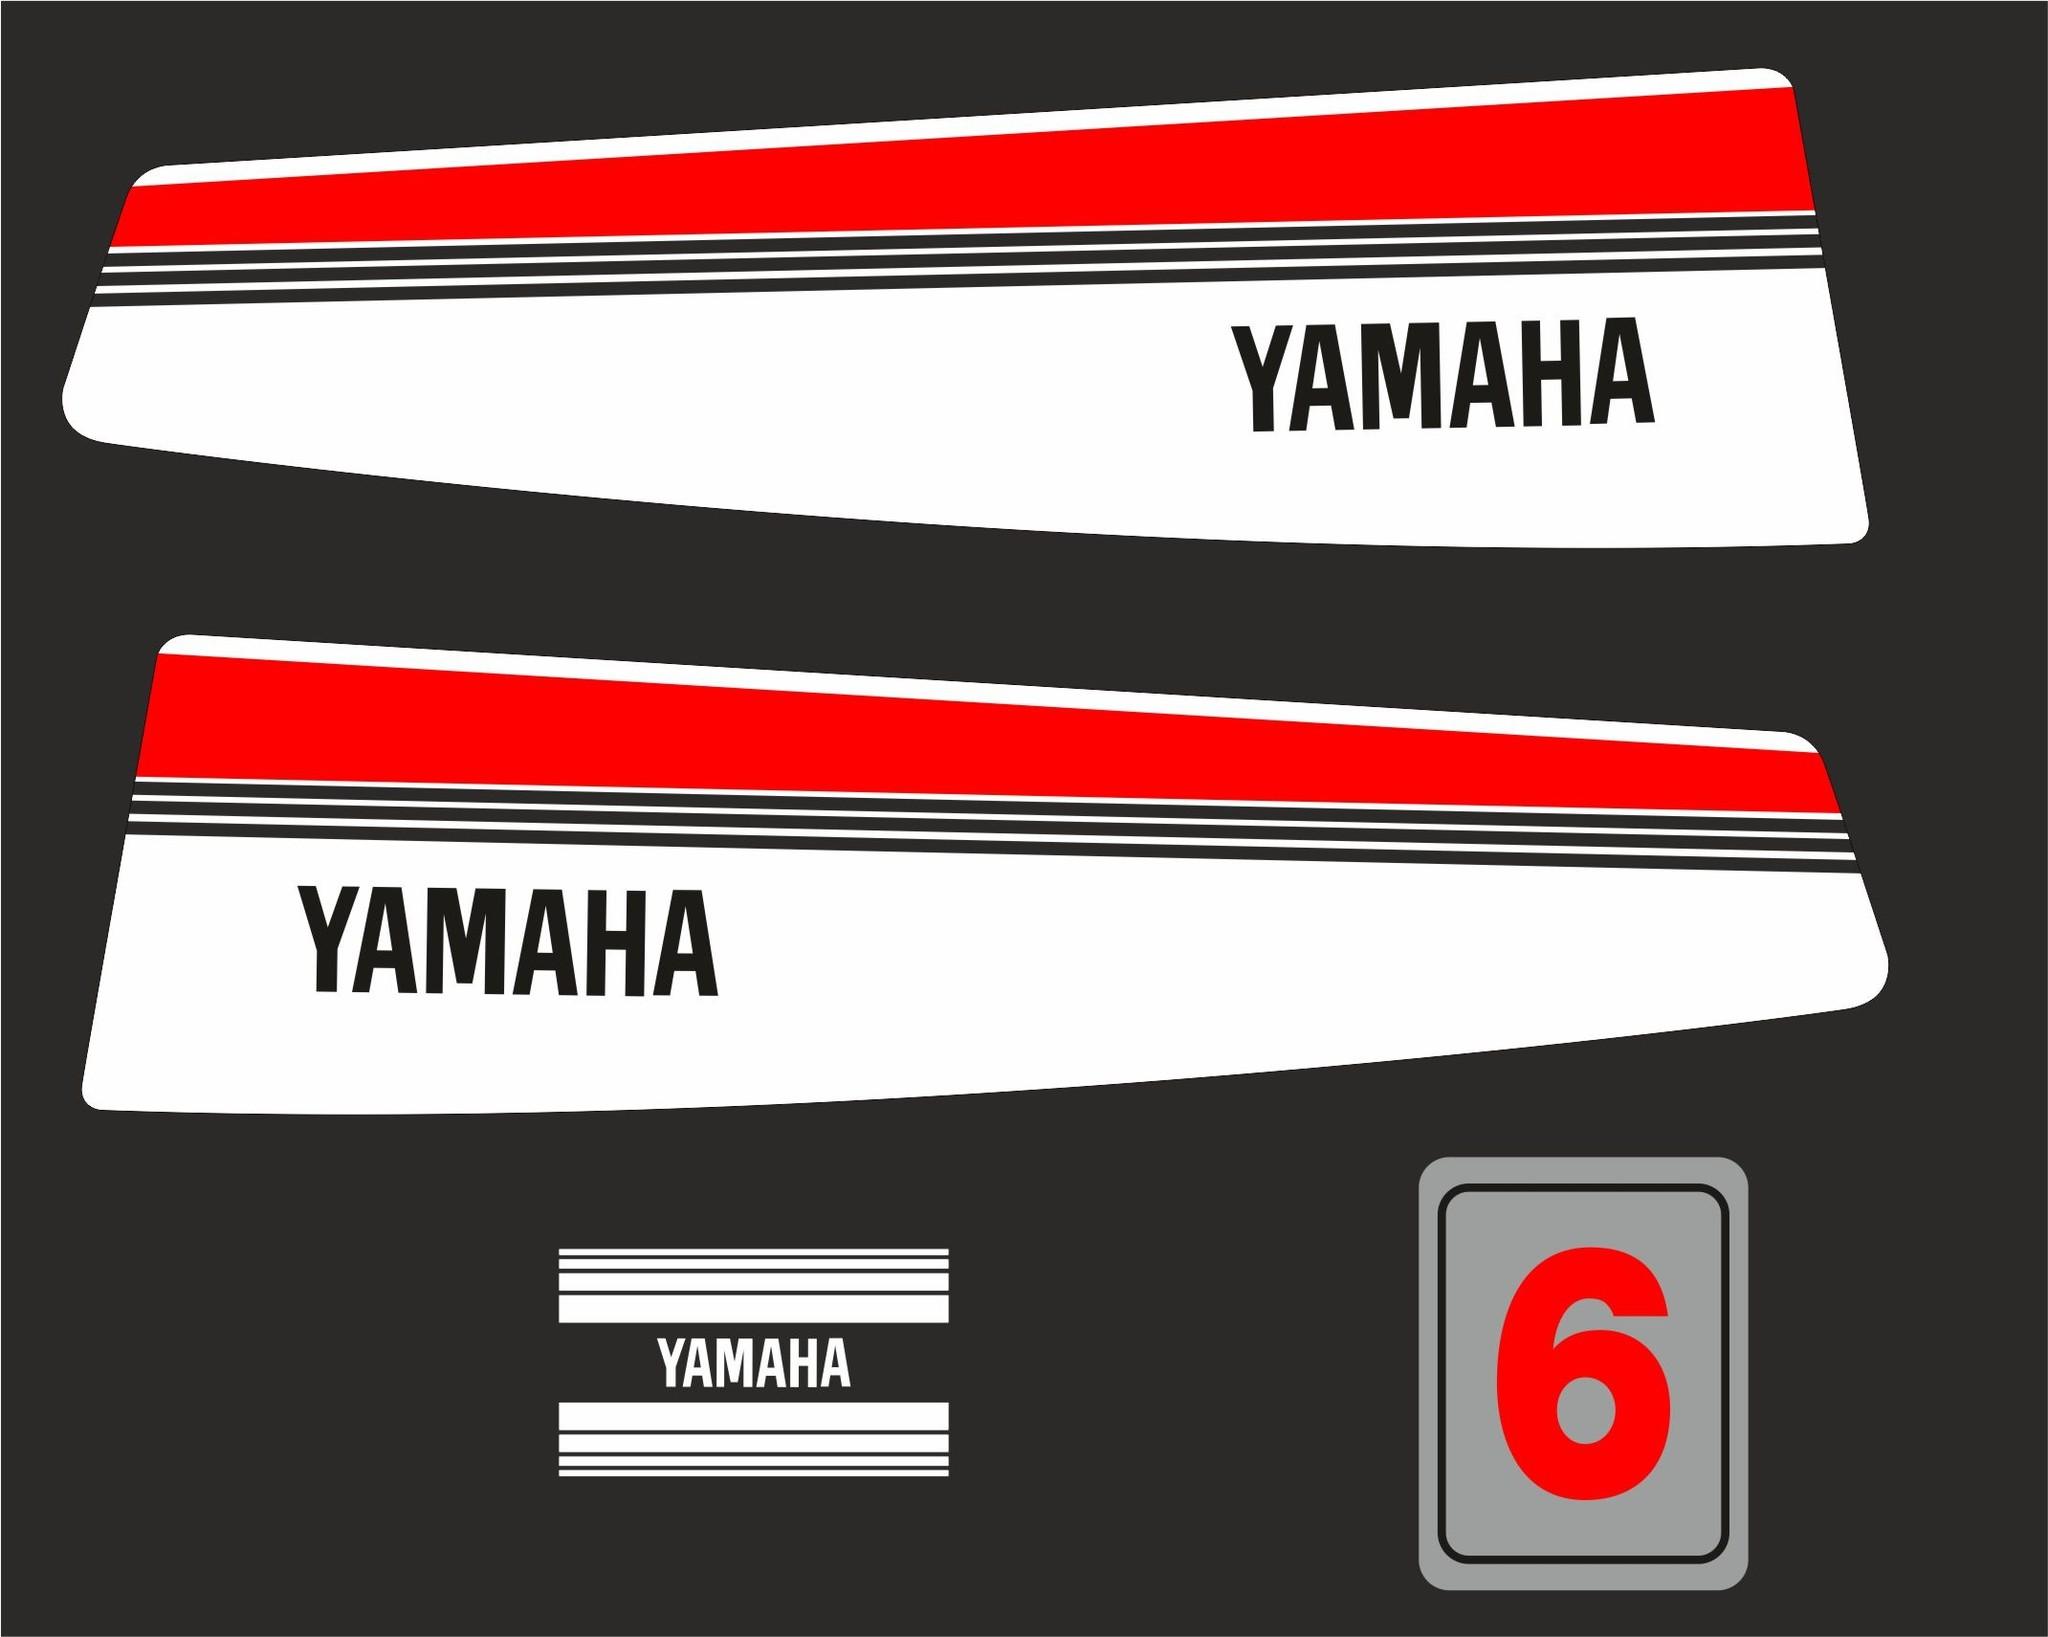 Yamaha 6 bouwjaar 1983- 1988 Sticker set